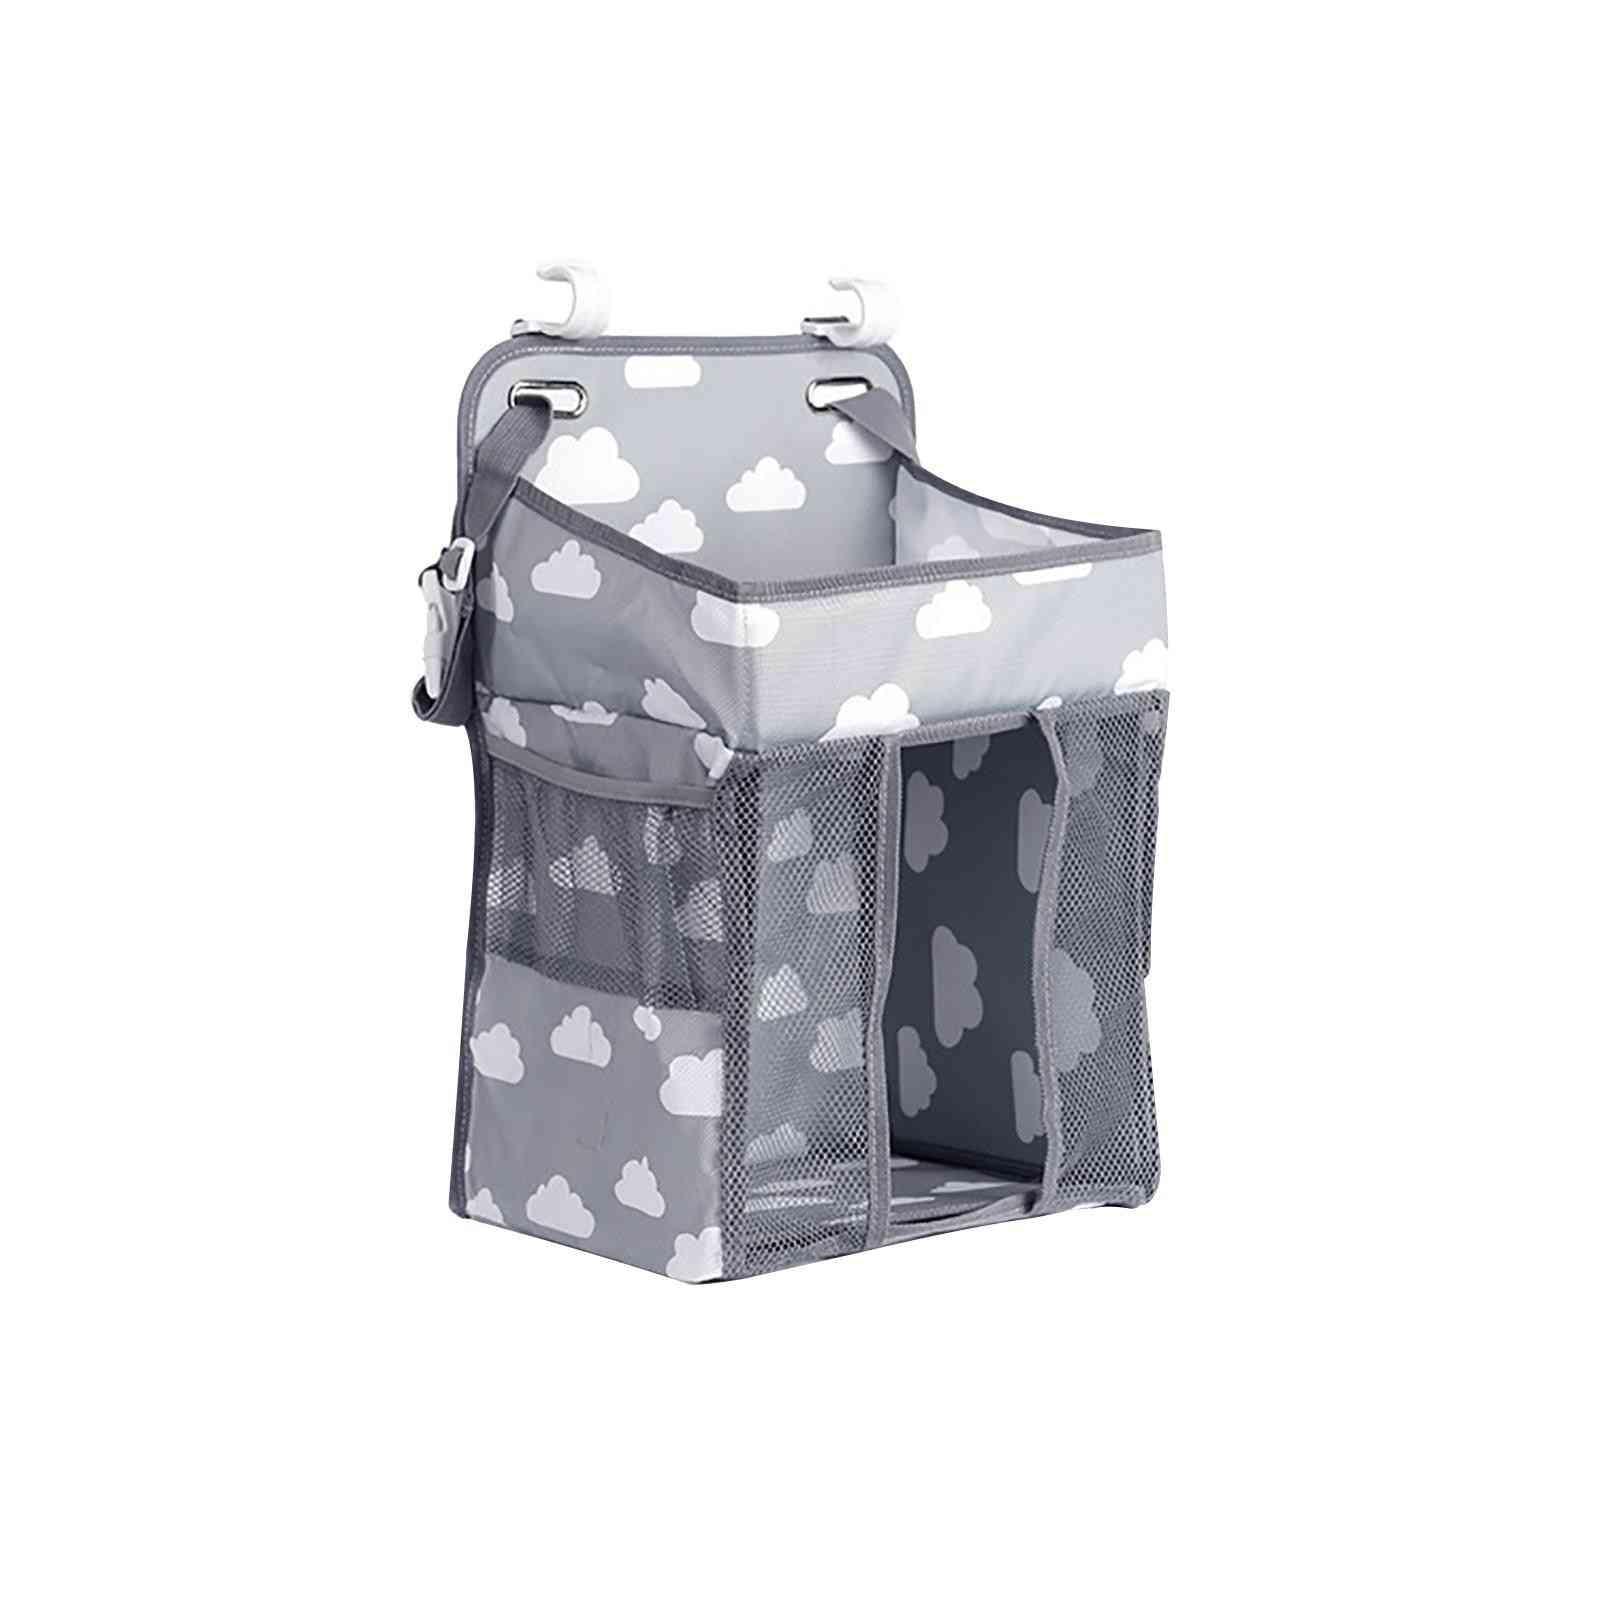 Hanging Storage Bag With Large Capacity Bedside Organizer